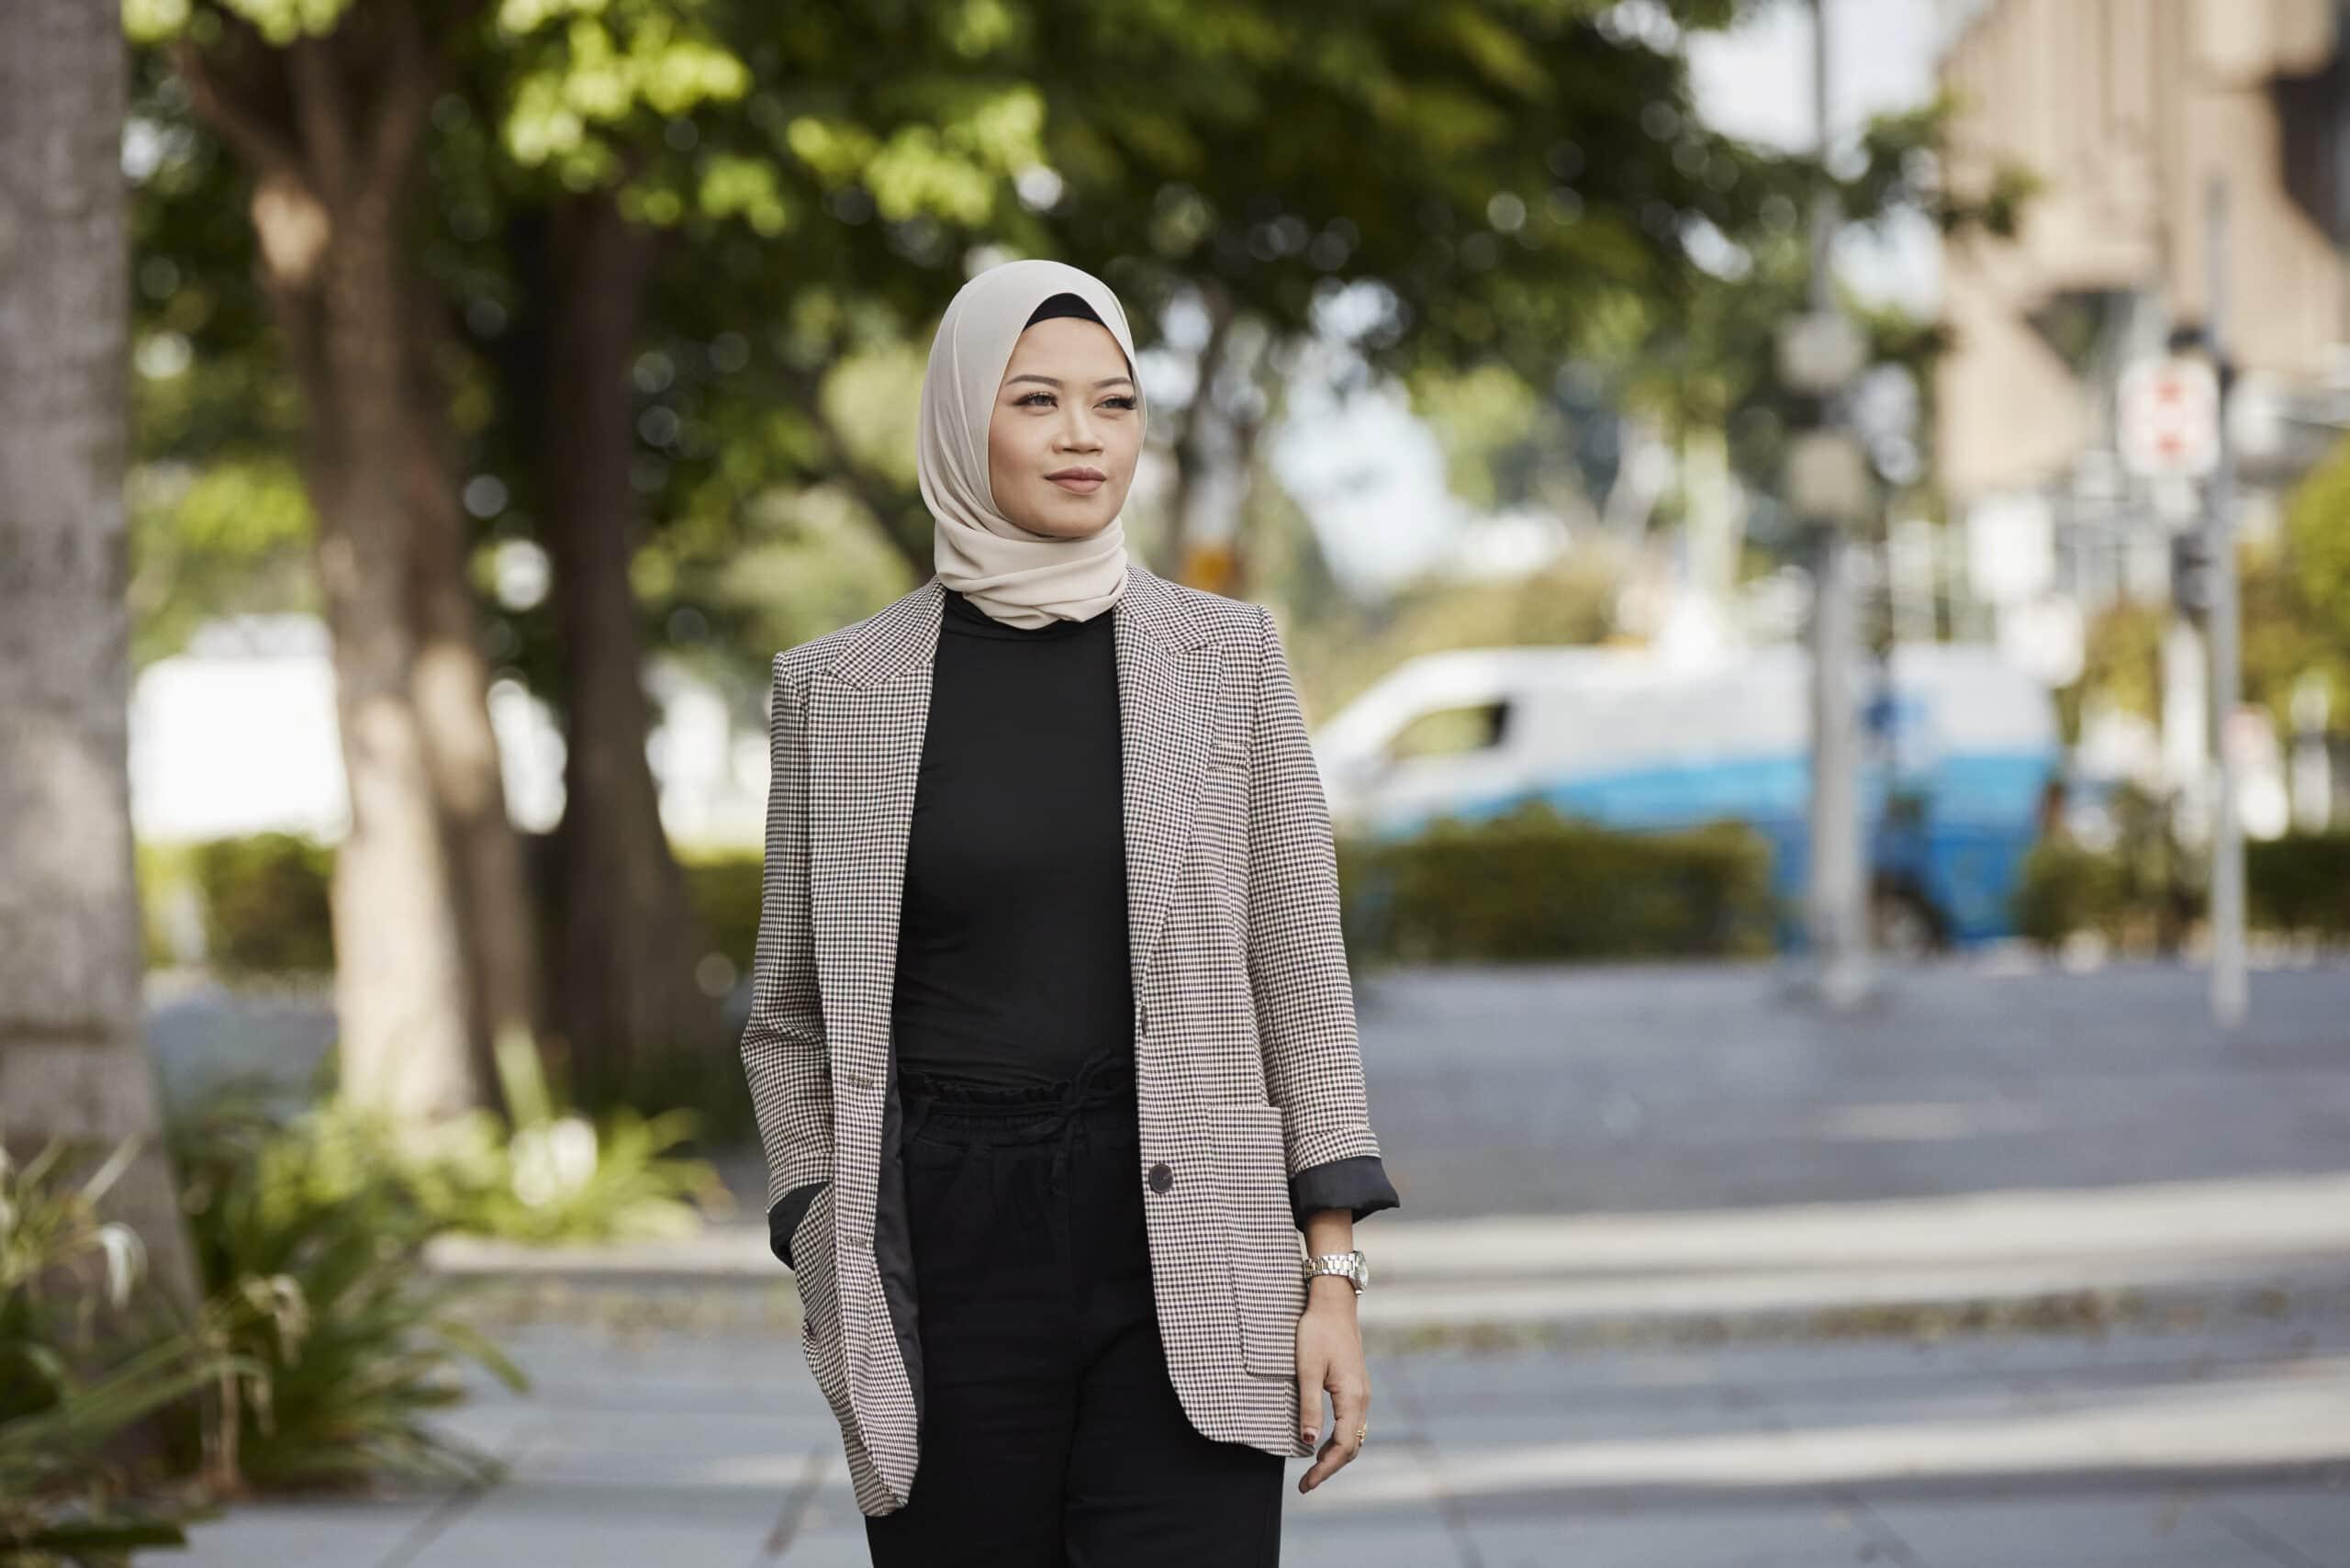 Huda Mohd Sa'ad, Corporate Secretary, Singapore, North-East